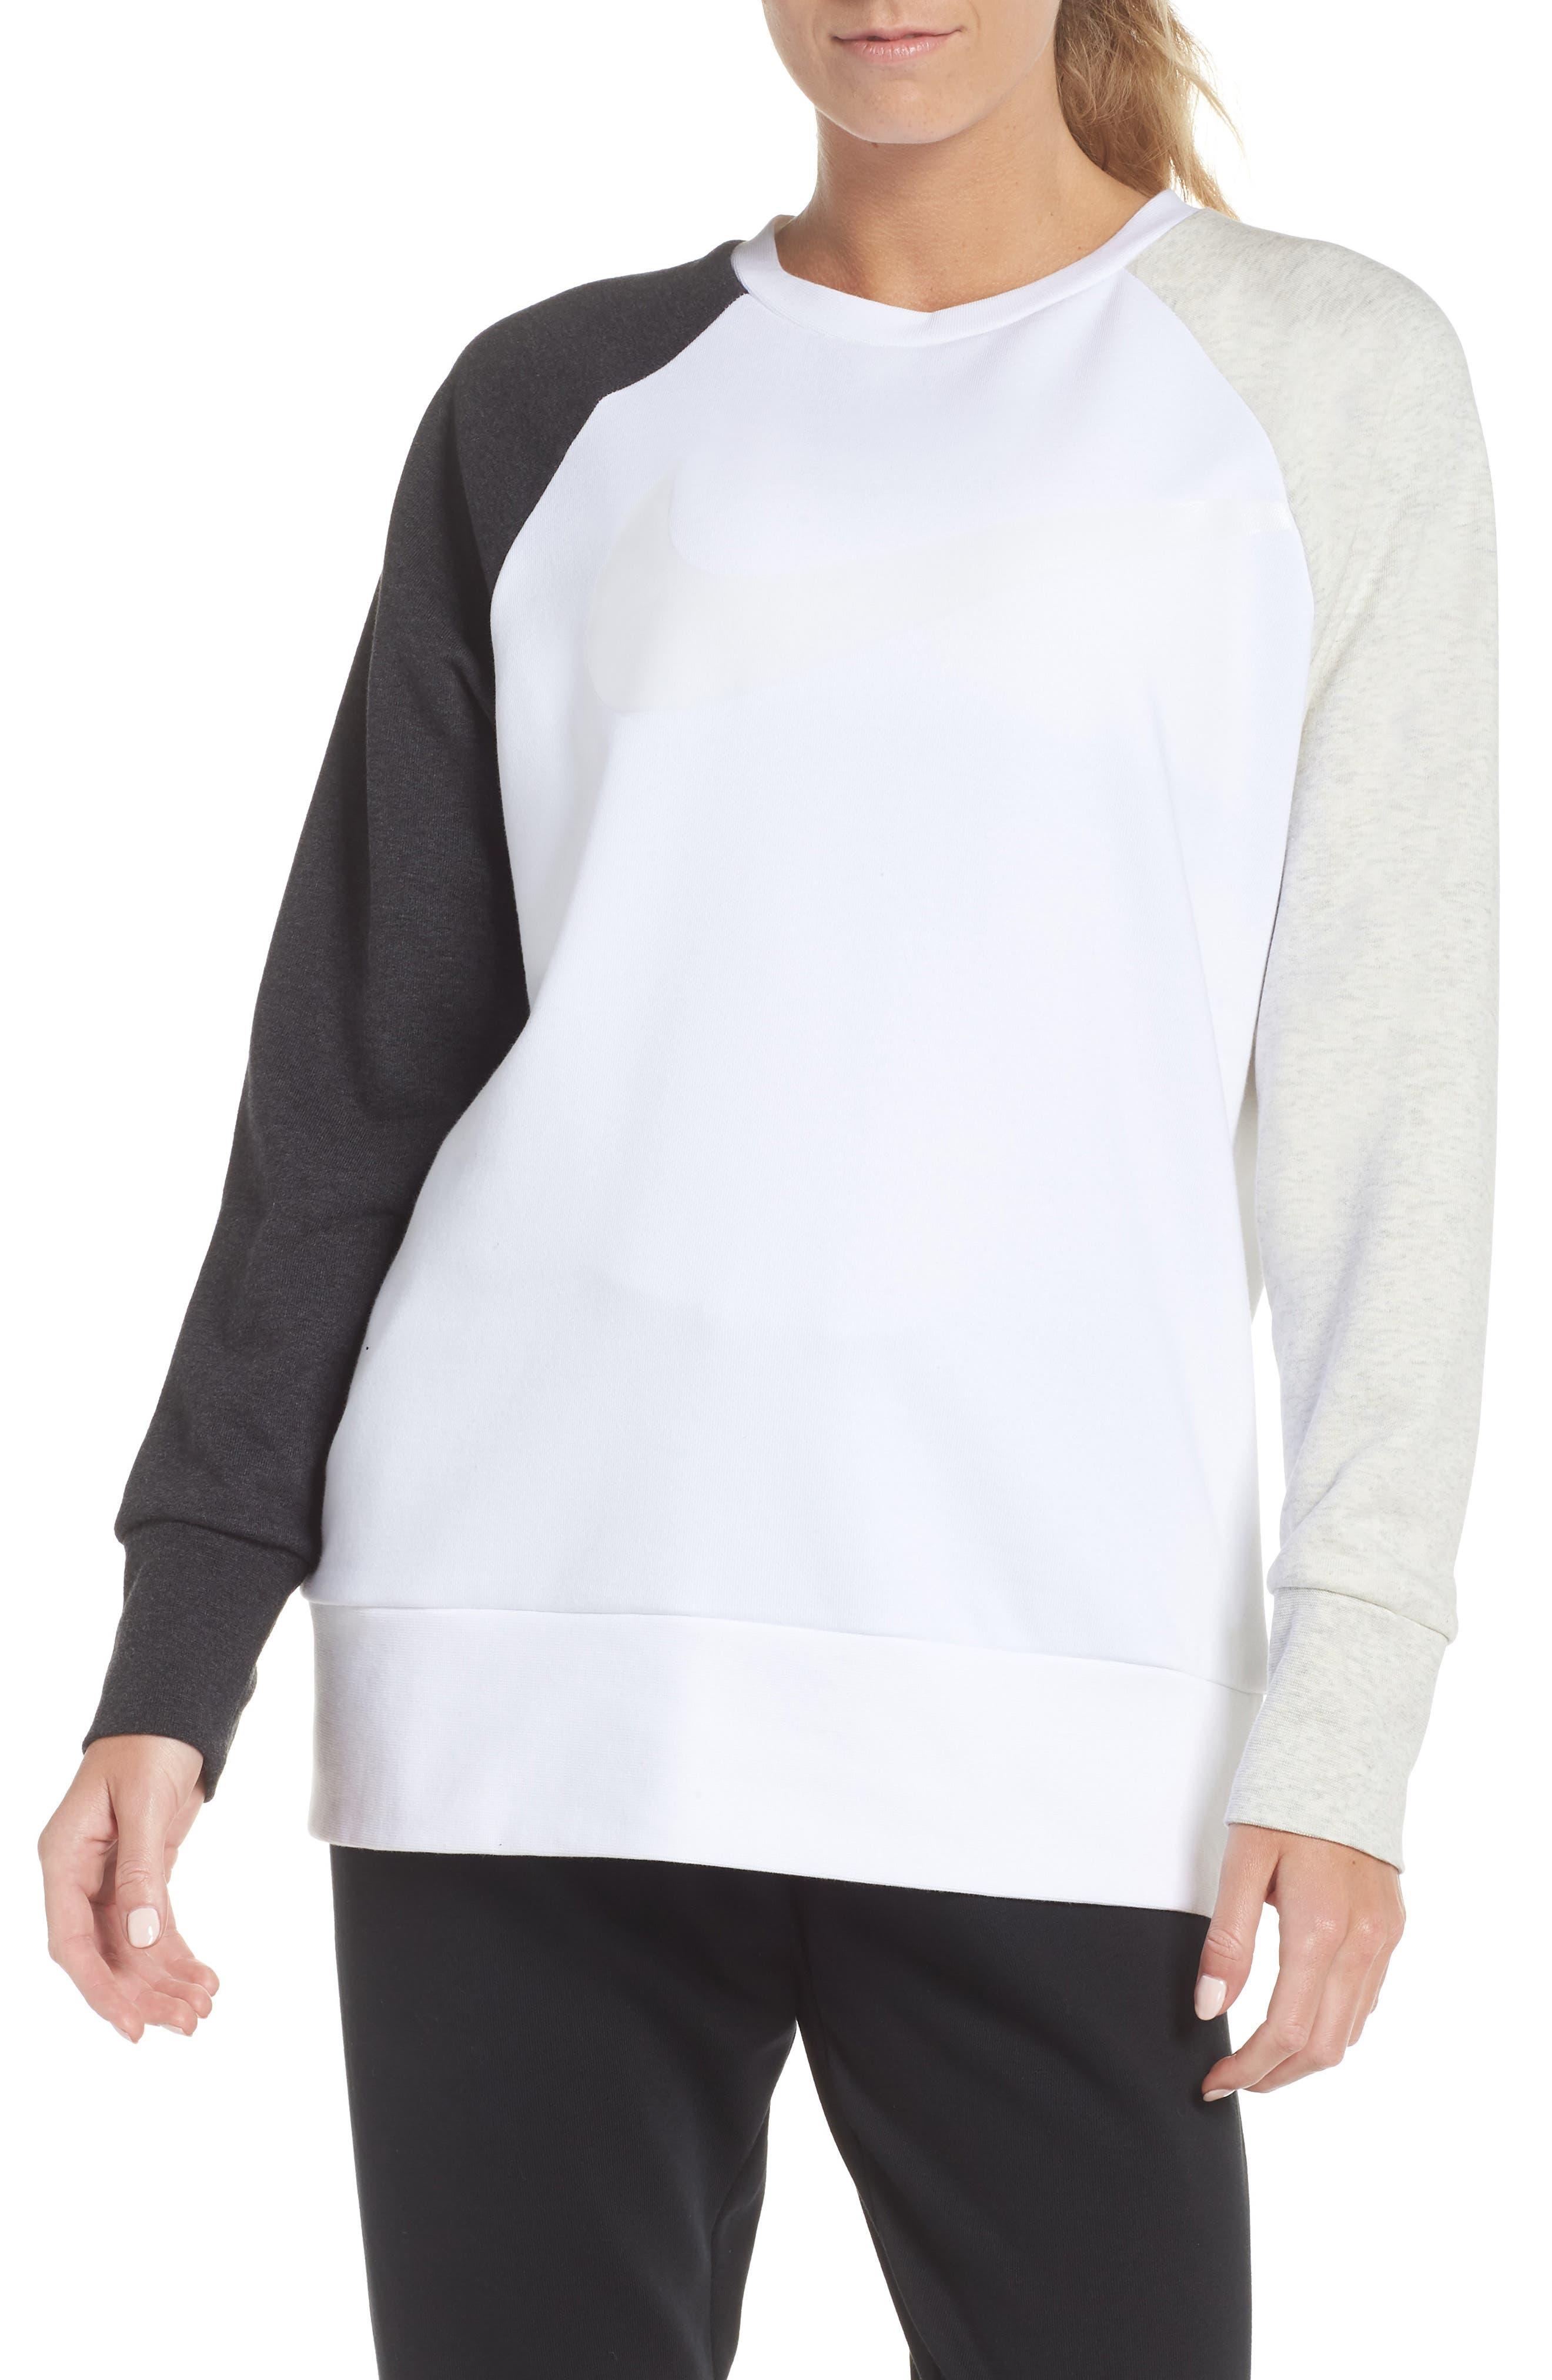 Dry Swoosh Sweatshirt,                             Main thumbnail 1, color,                             WHITE/ BLACK HEATHER/ WHITE